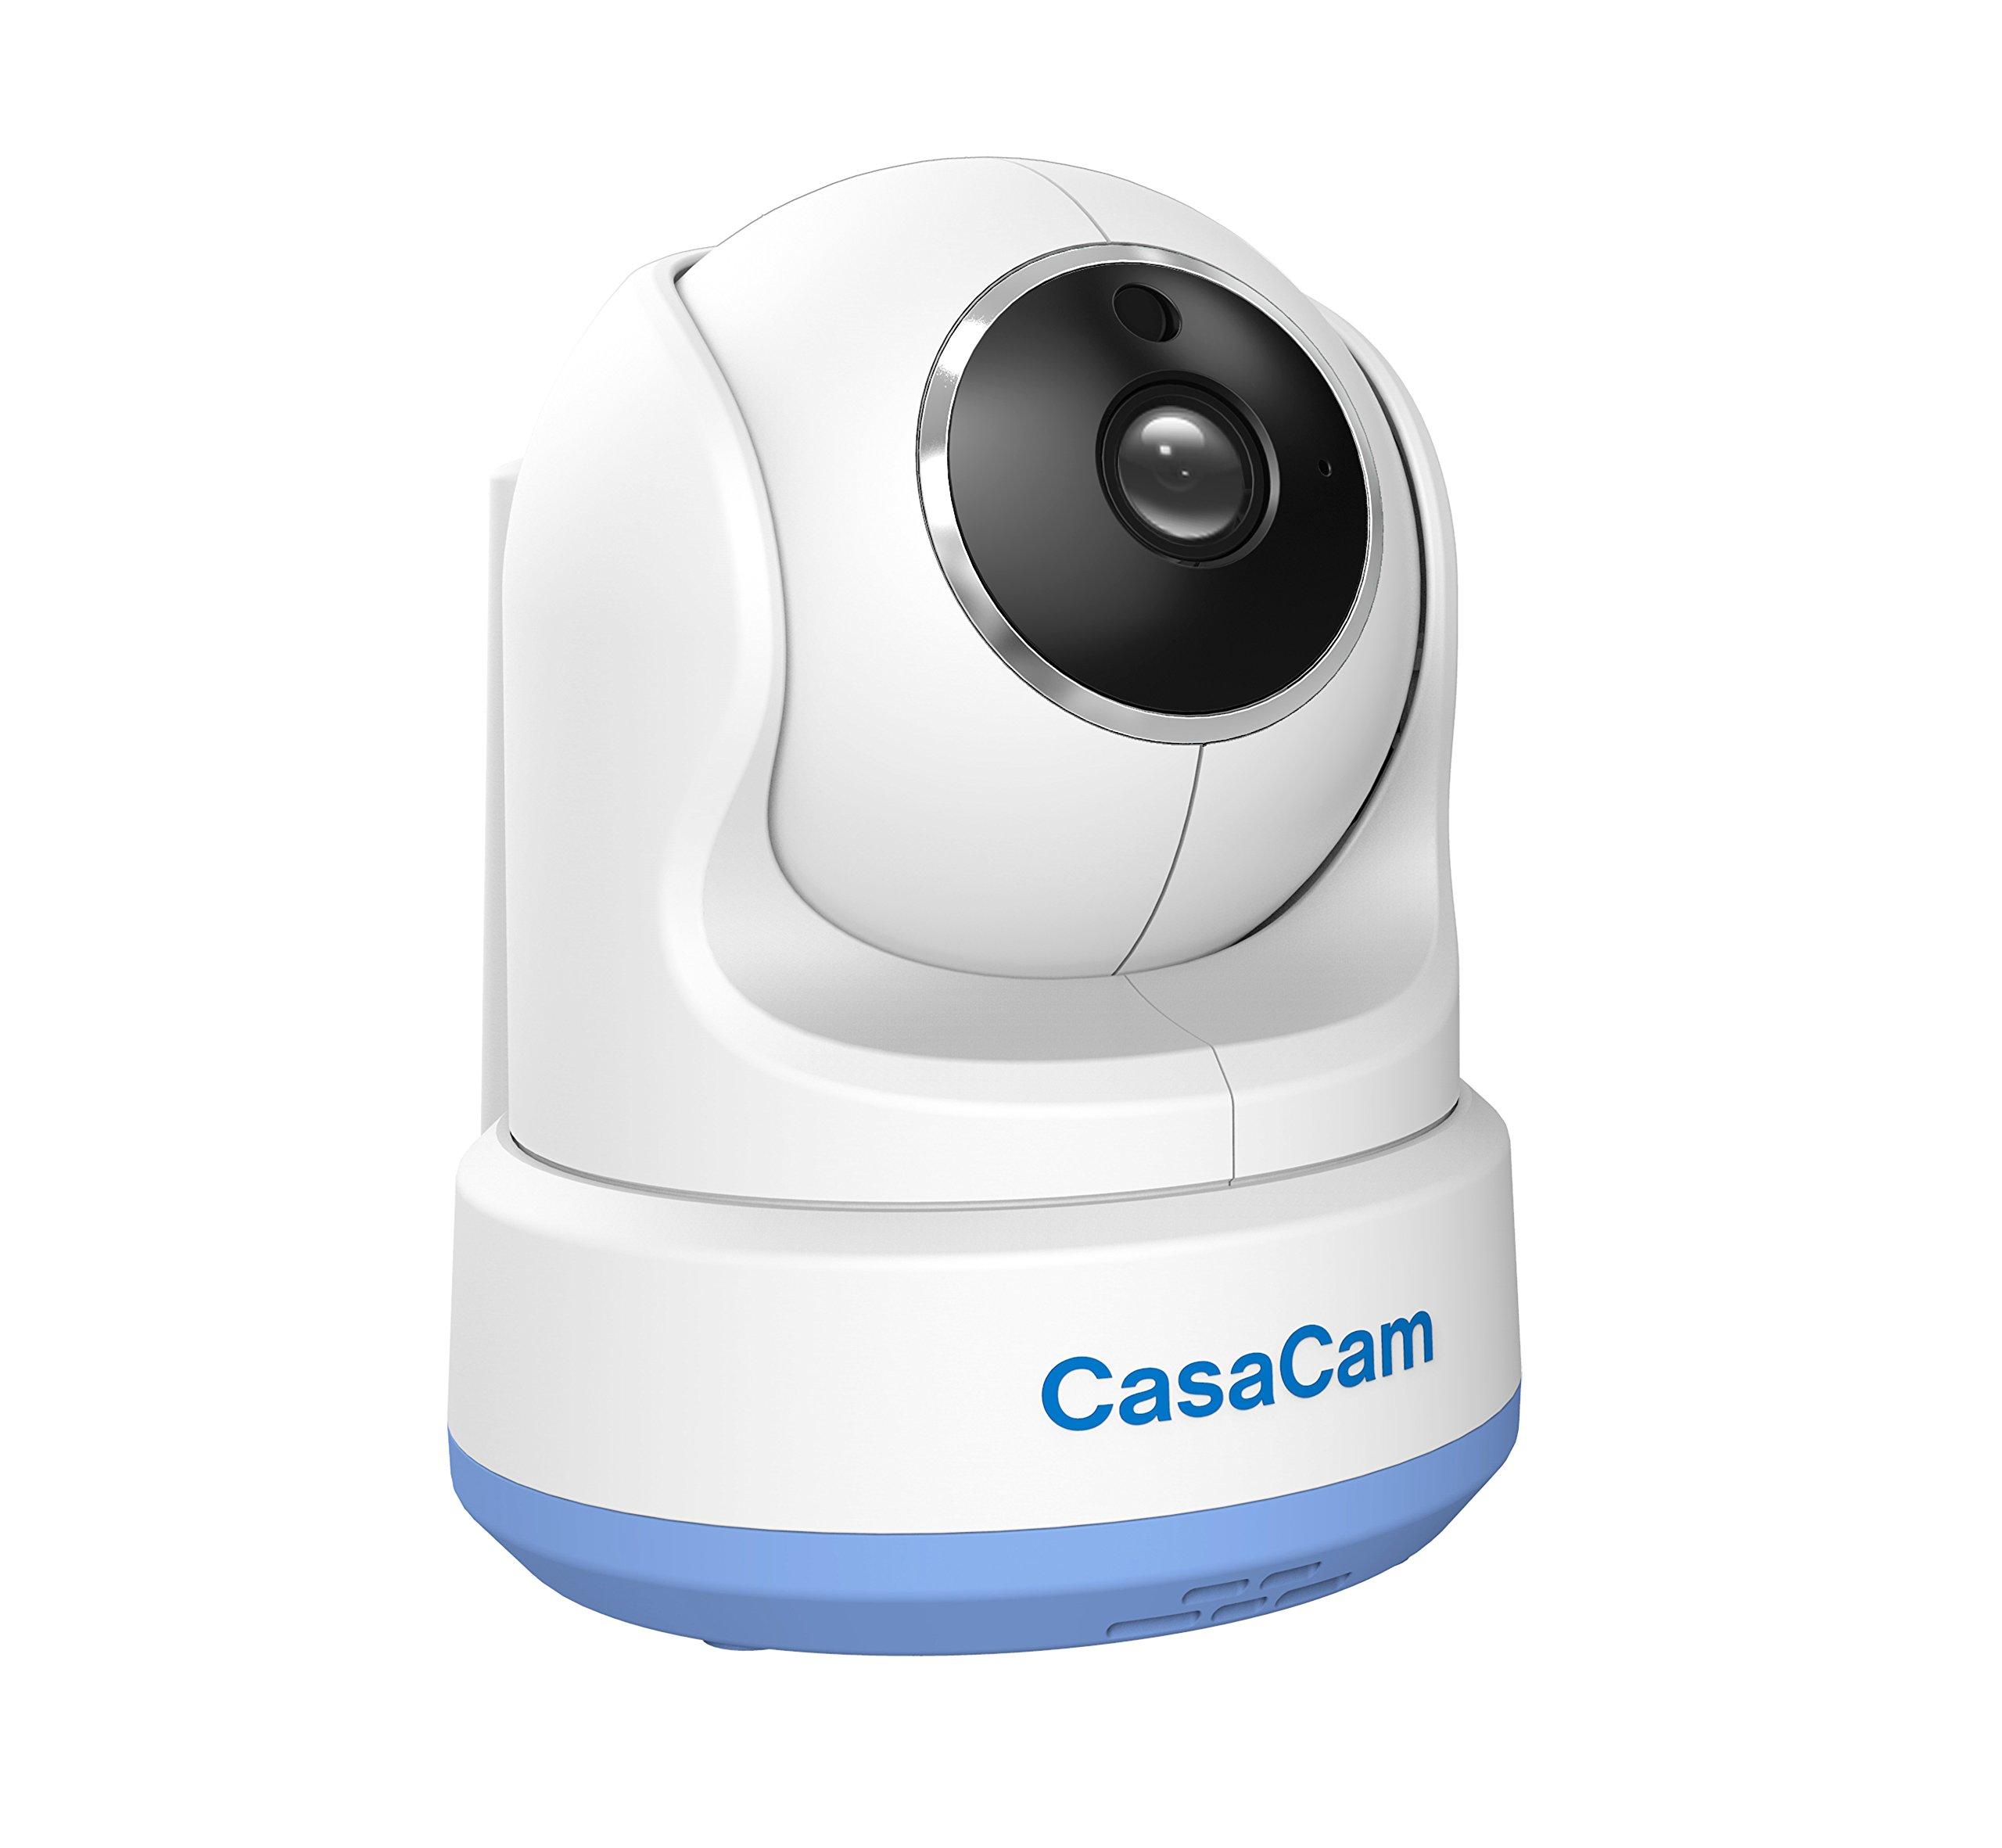 CasaCam BC200 Digital Wireless HD Pan & Tilt Baby Camera, Add-on Camera for CasaCam BM200, Two-Way Audio, Night Vision, Temperature Monitoring, Night Light and Lullabies